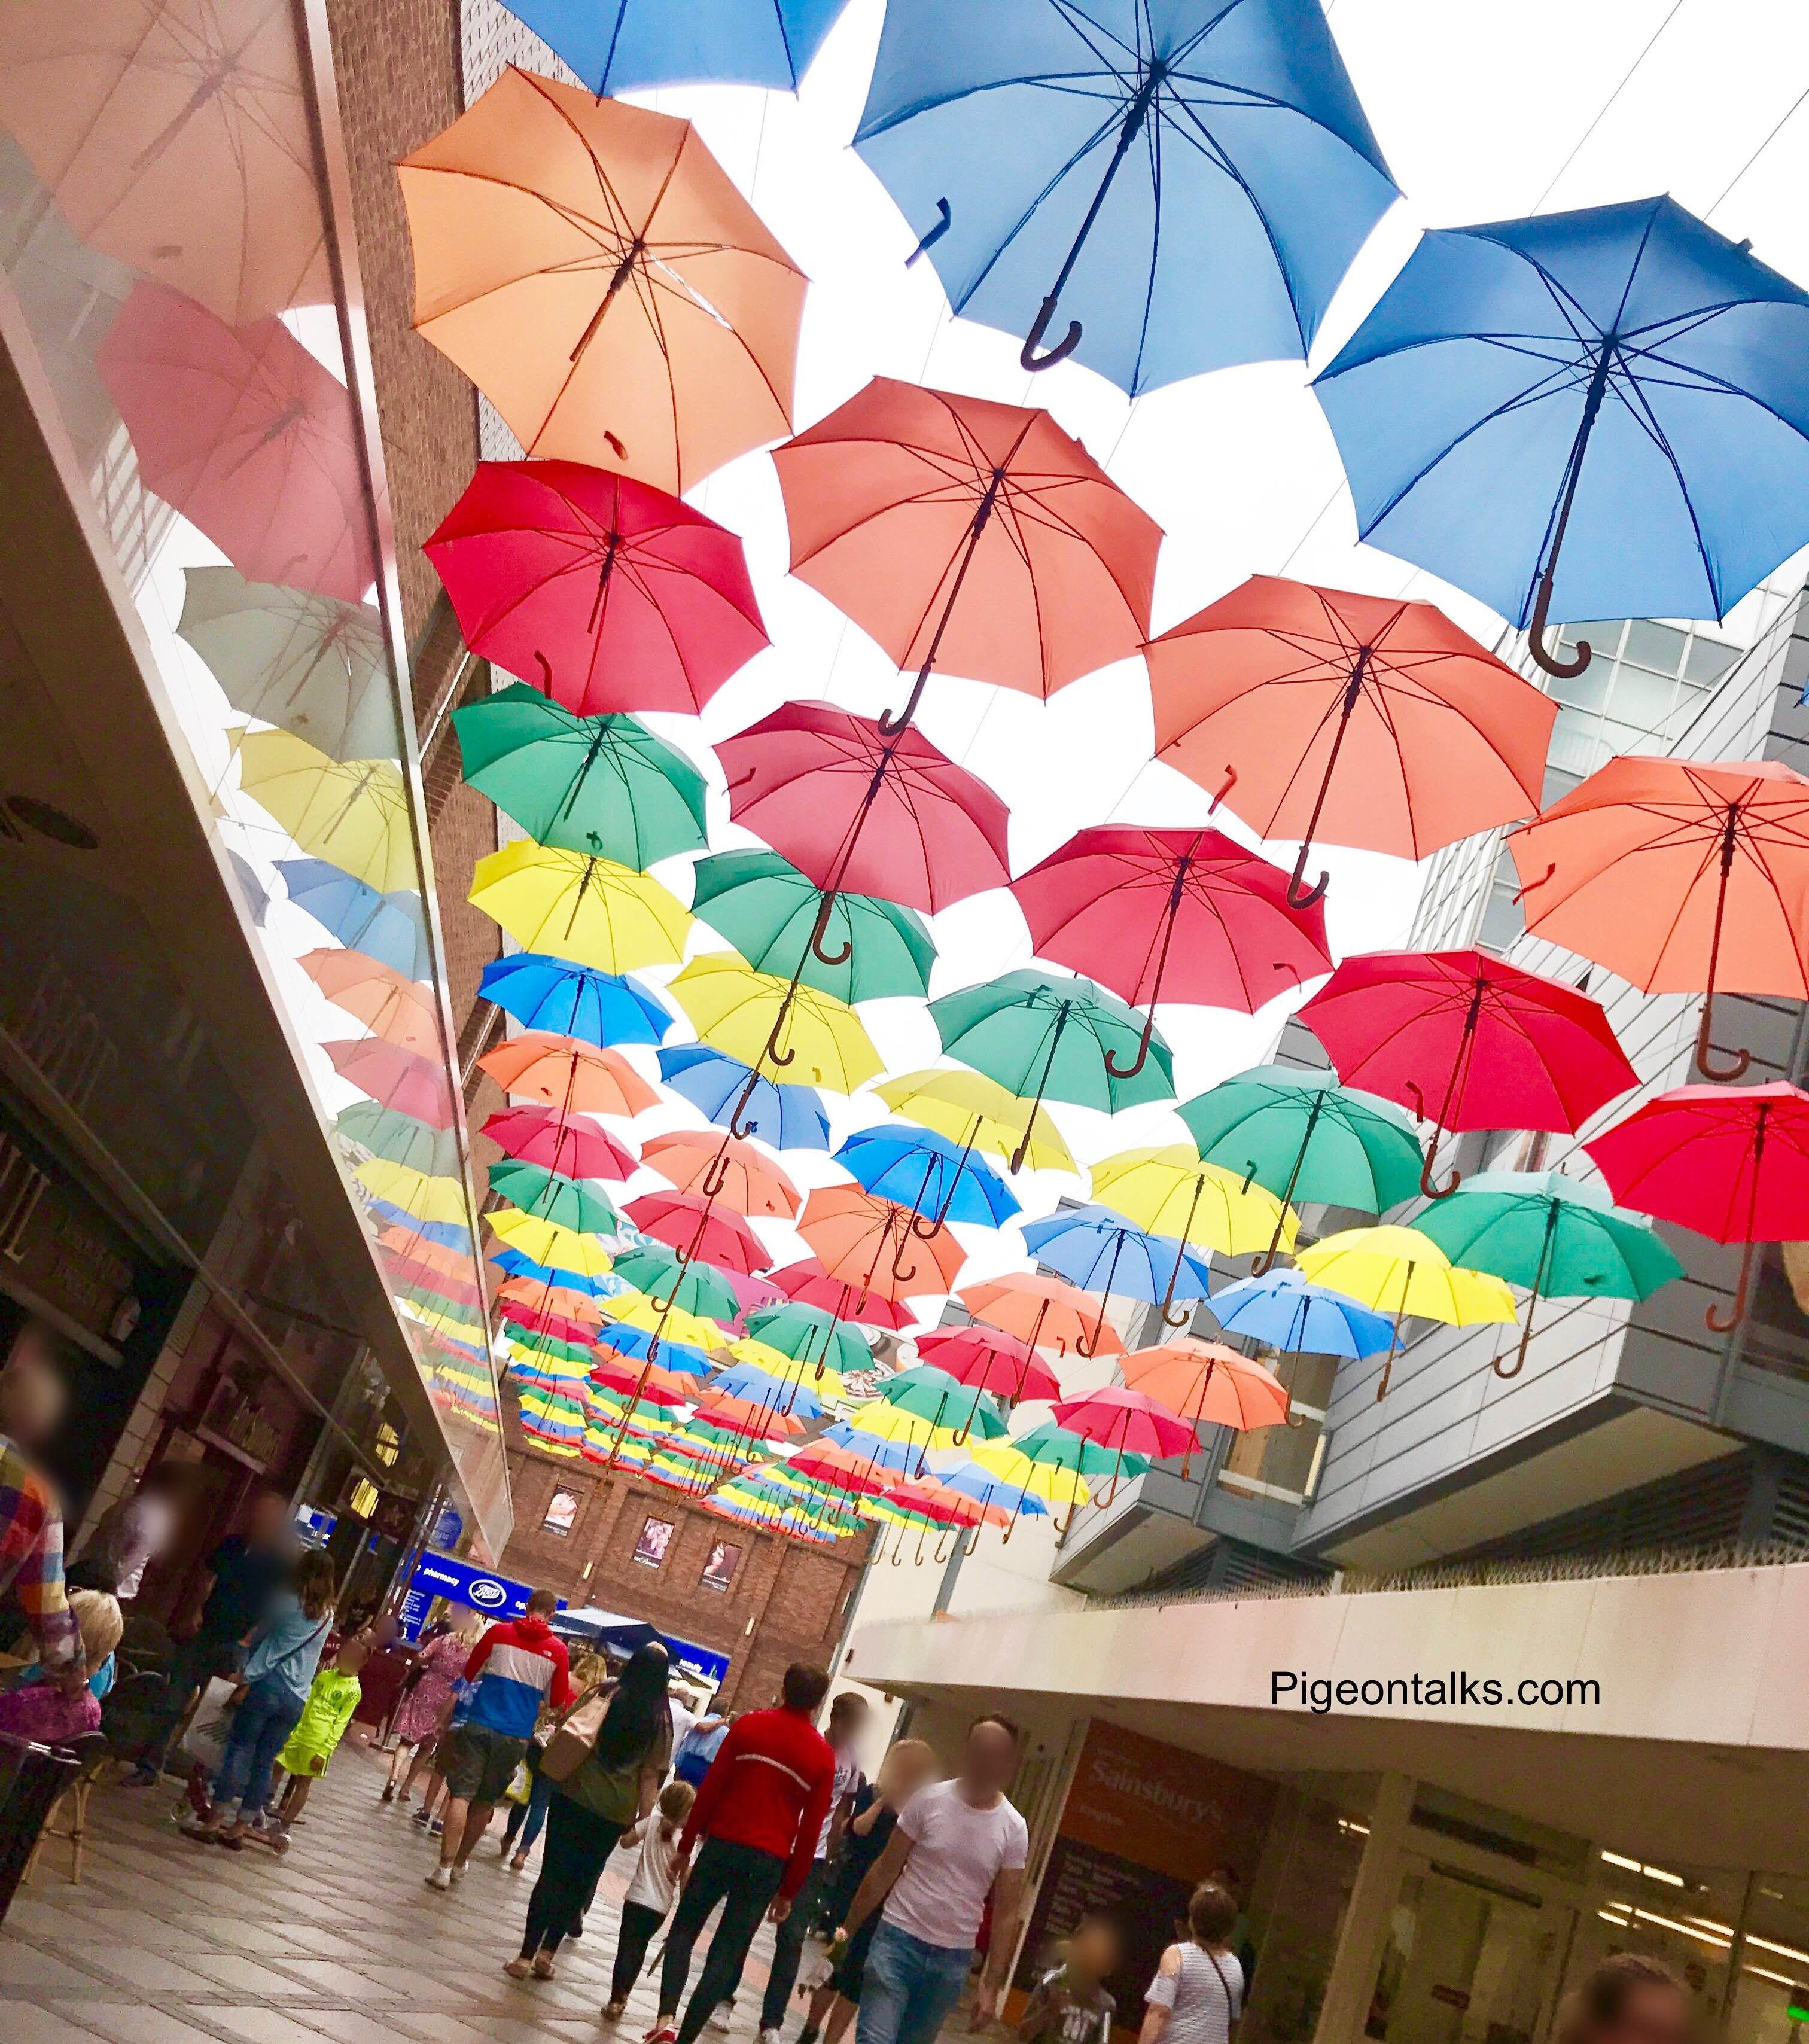 Kingston is prepared for a British summer  #london #kingston #umbrella #art #summer #rain #colour #verynice #random #funny #pigeontalks